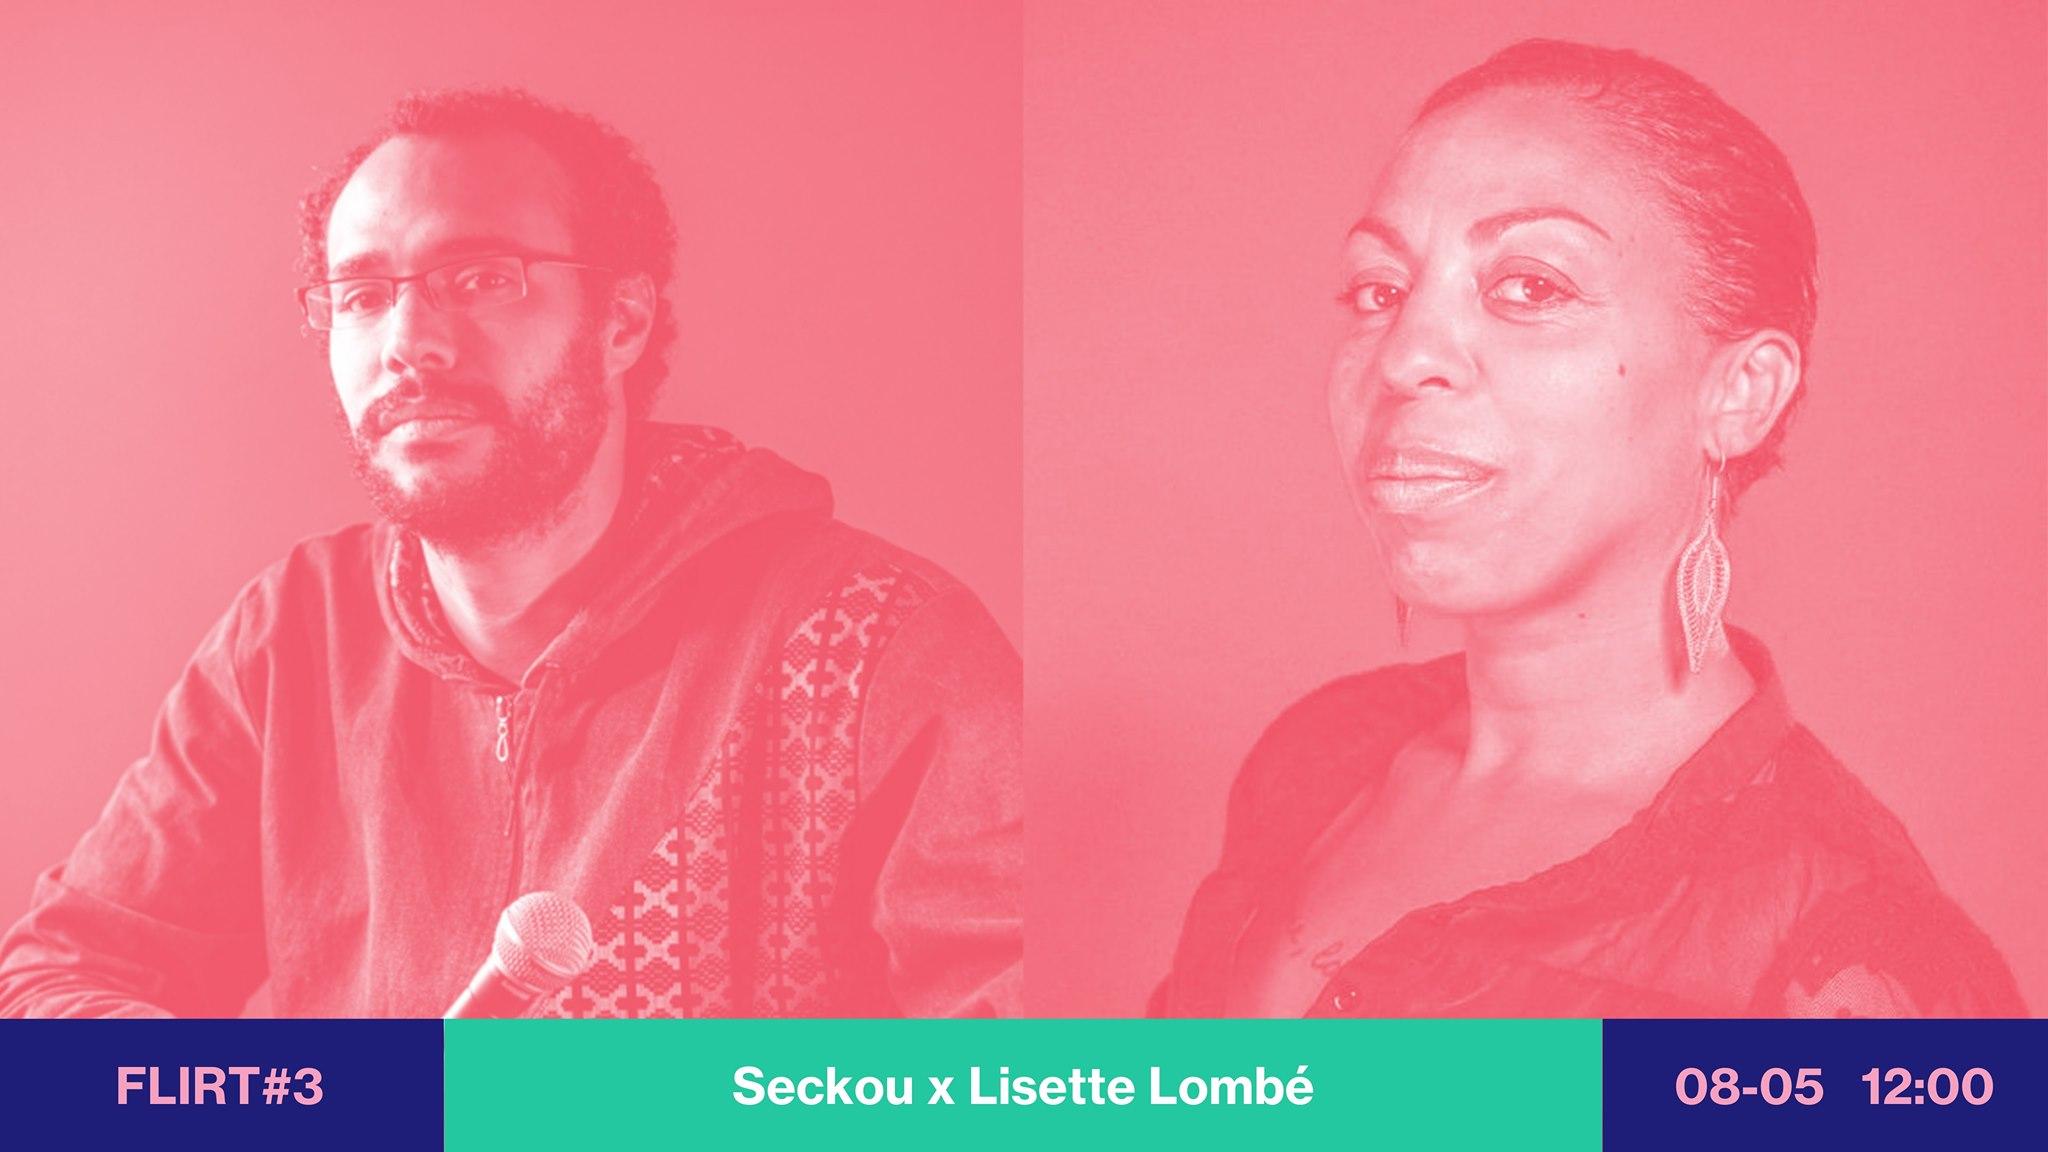 FLIRT #3 Seckou & Lisette Lombé